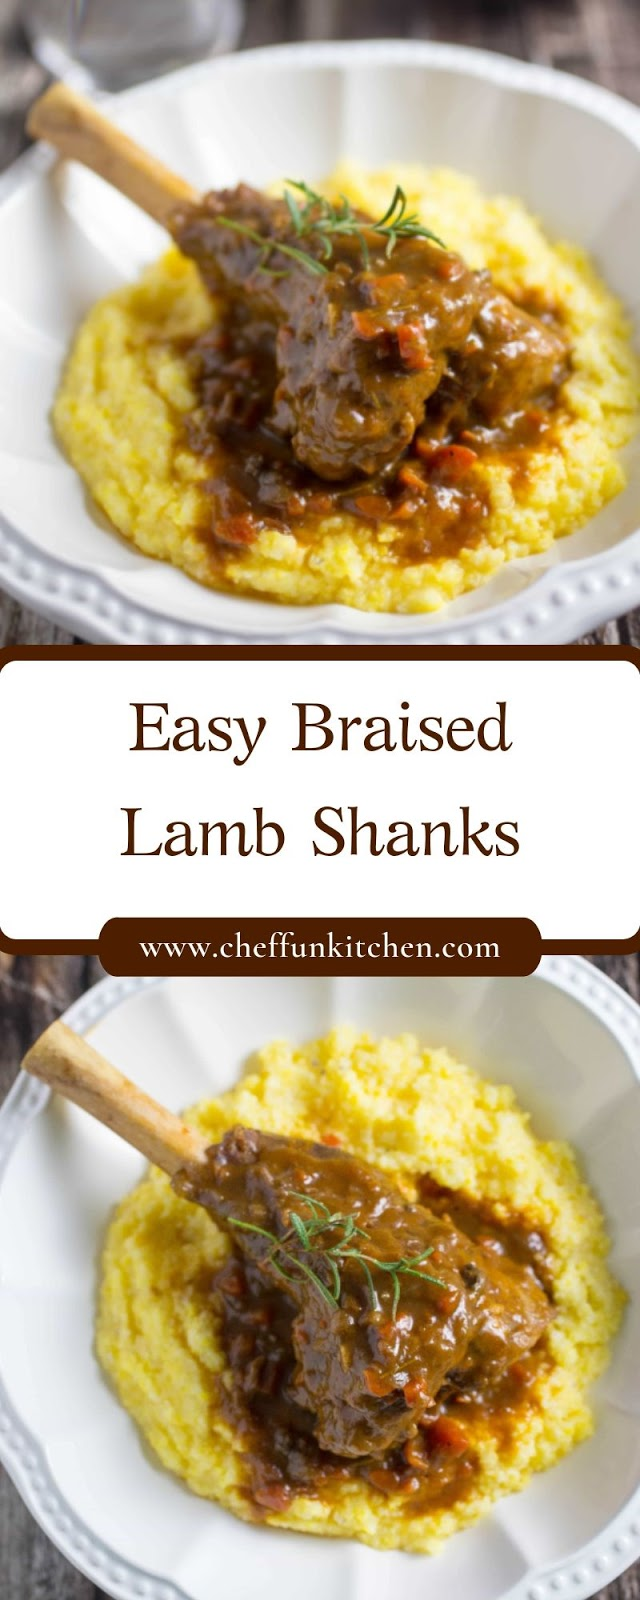 Easy Braised Lamb Shanks